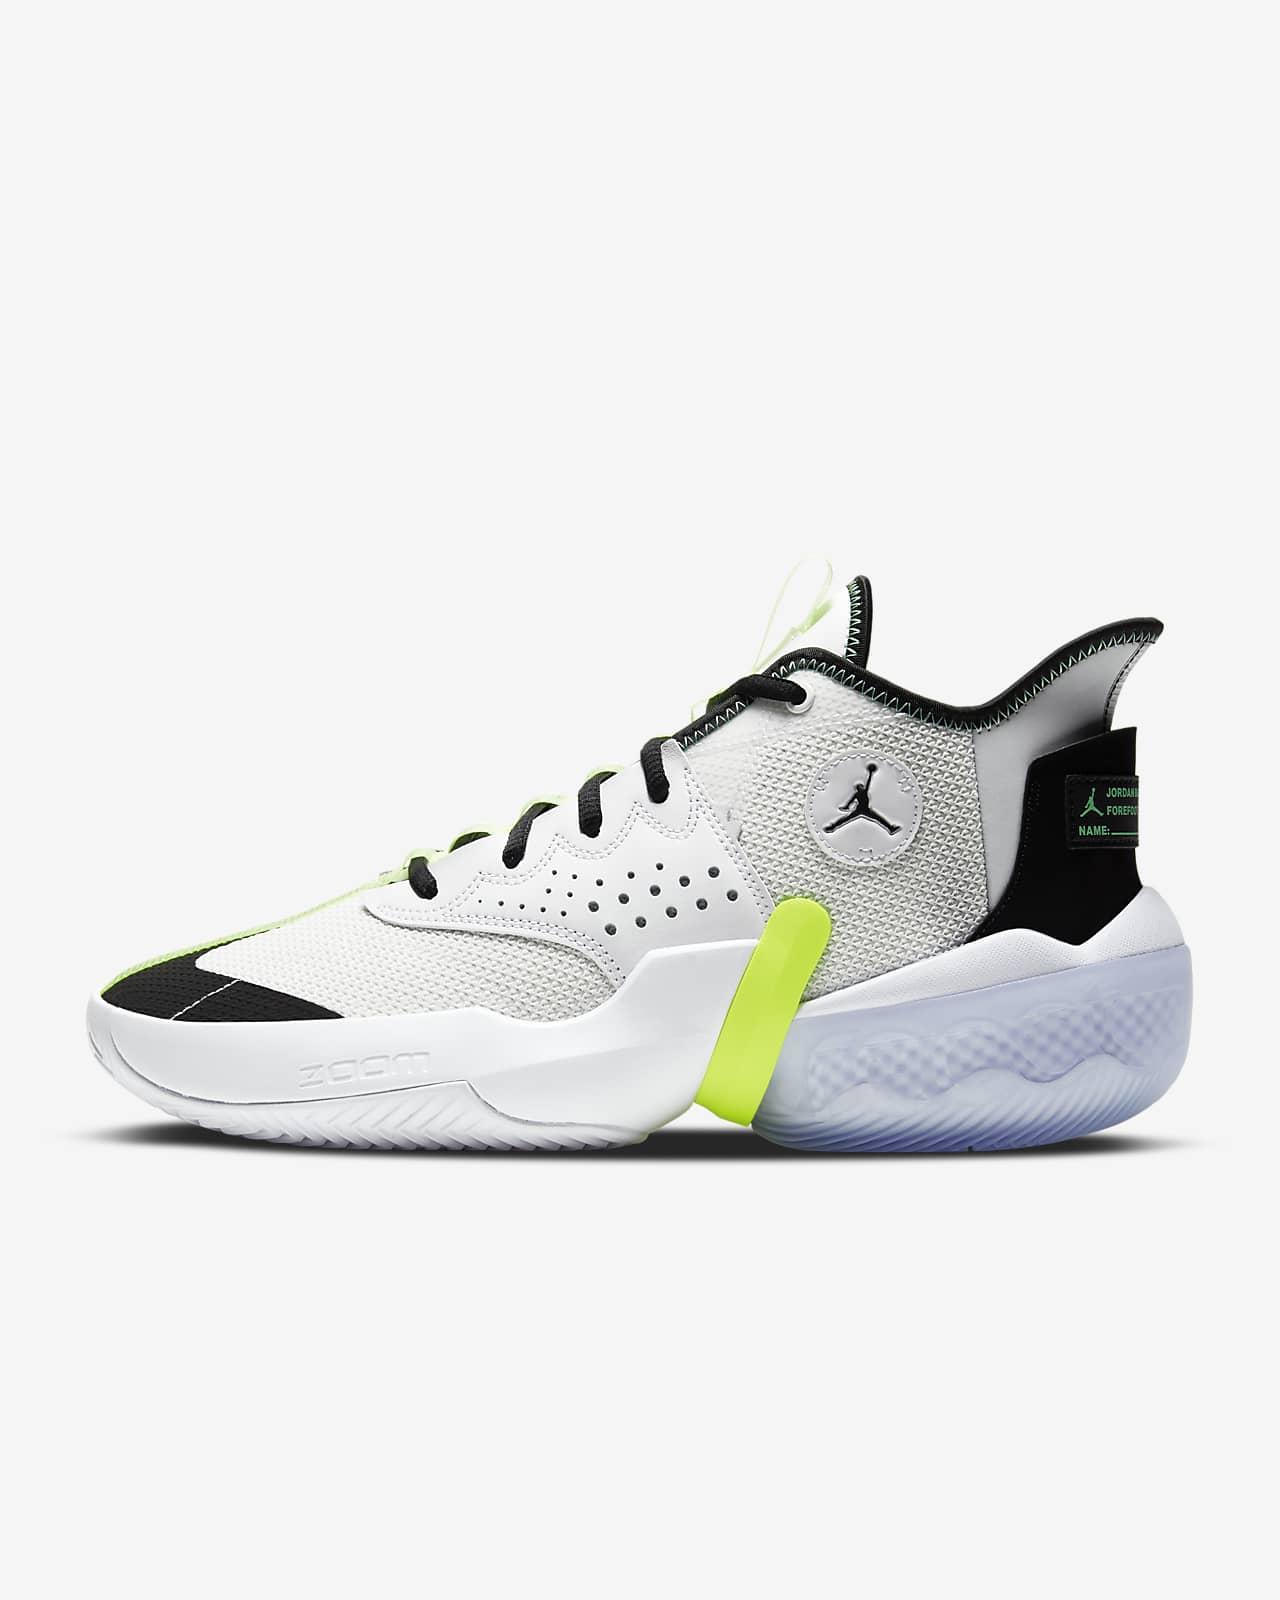 Pánská basketbalová bota Jordan React Elevation